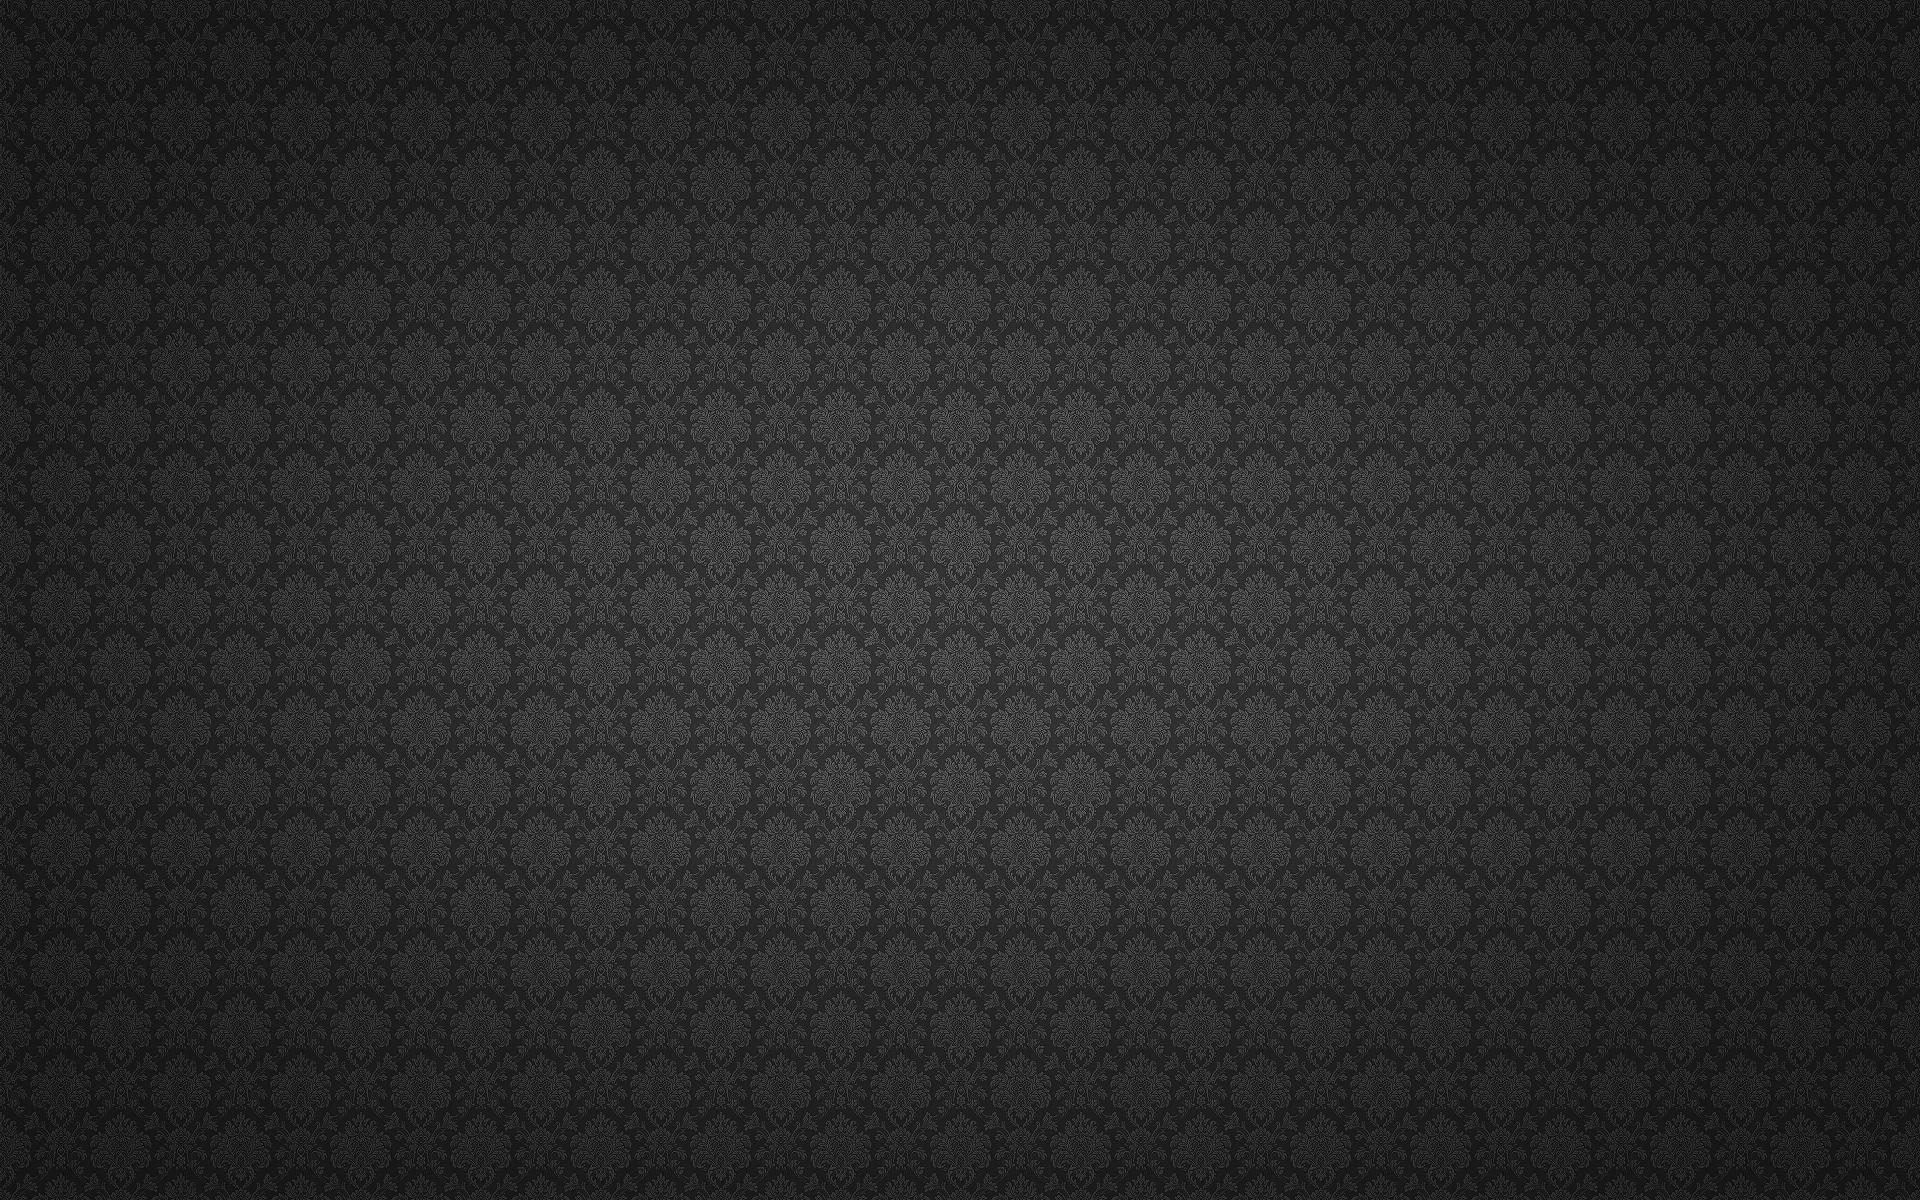 black-wallpaper-22.jpg